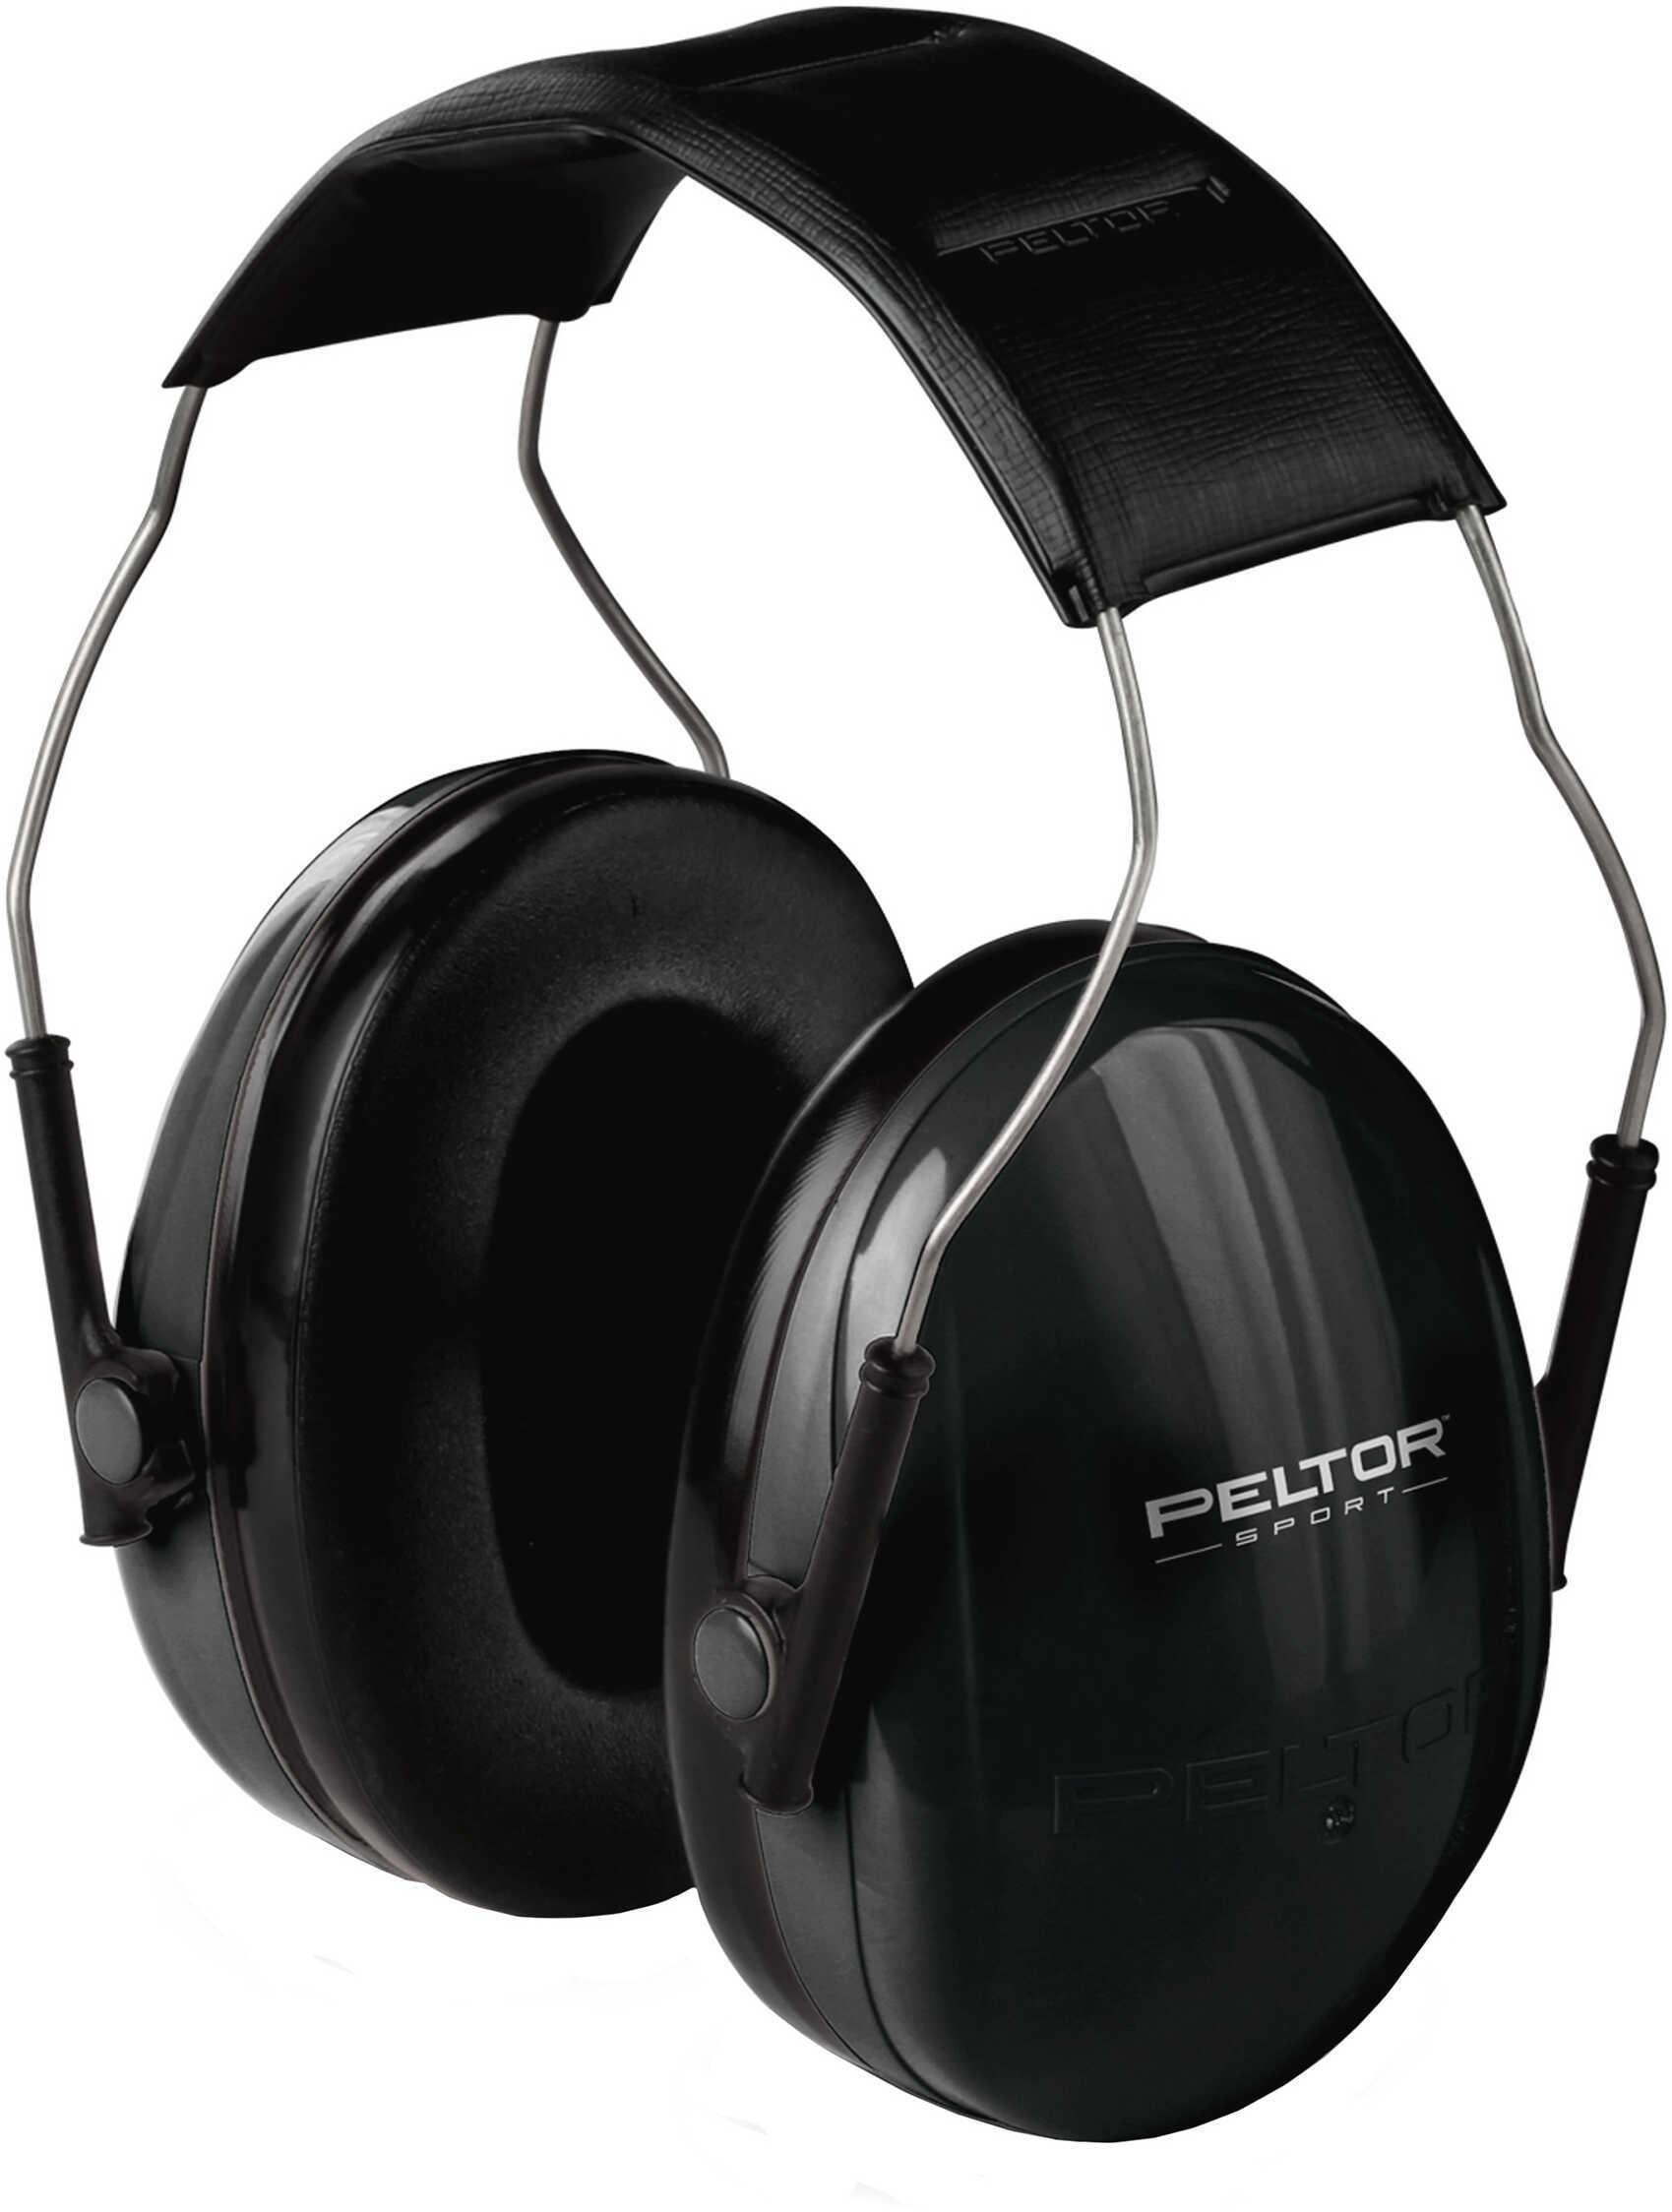 Peltor Passive Hearing Protectors Junior Earmuff Black (NRR 22dB) 97070-60000